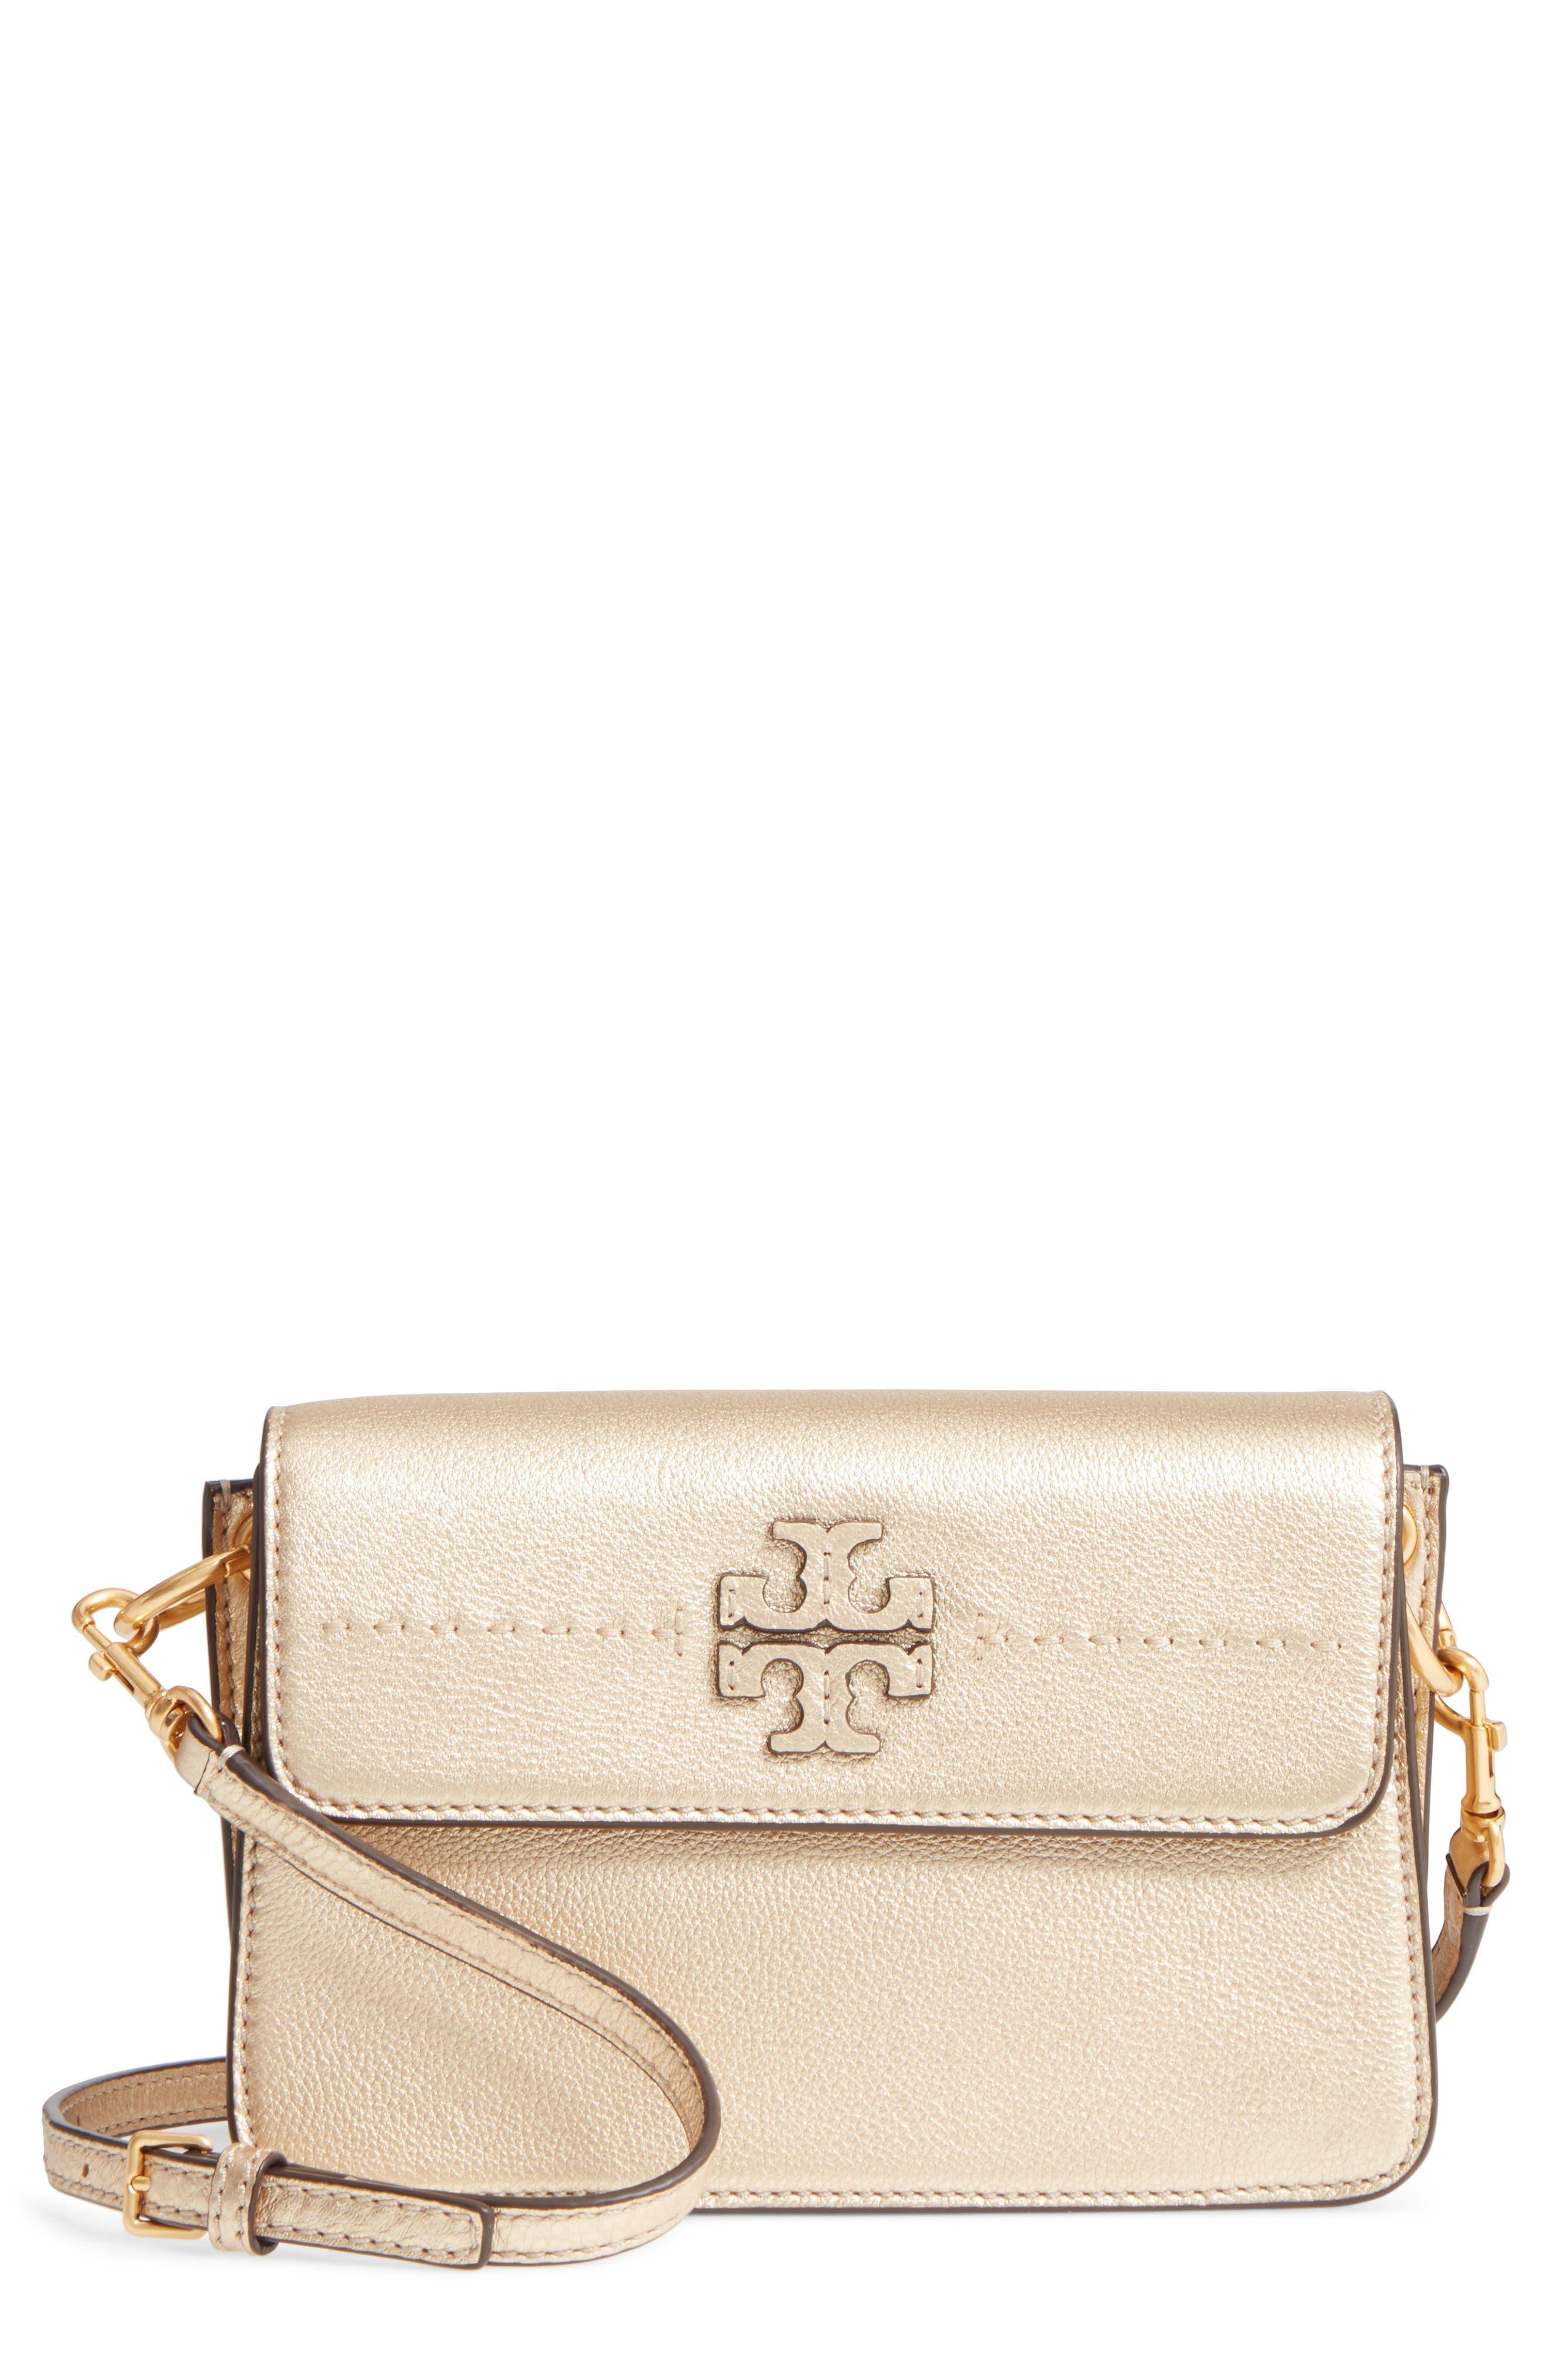 McGraw Metallic Leather Shoulder Bag,                         Main,                         color,